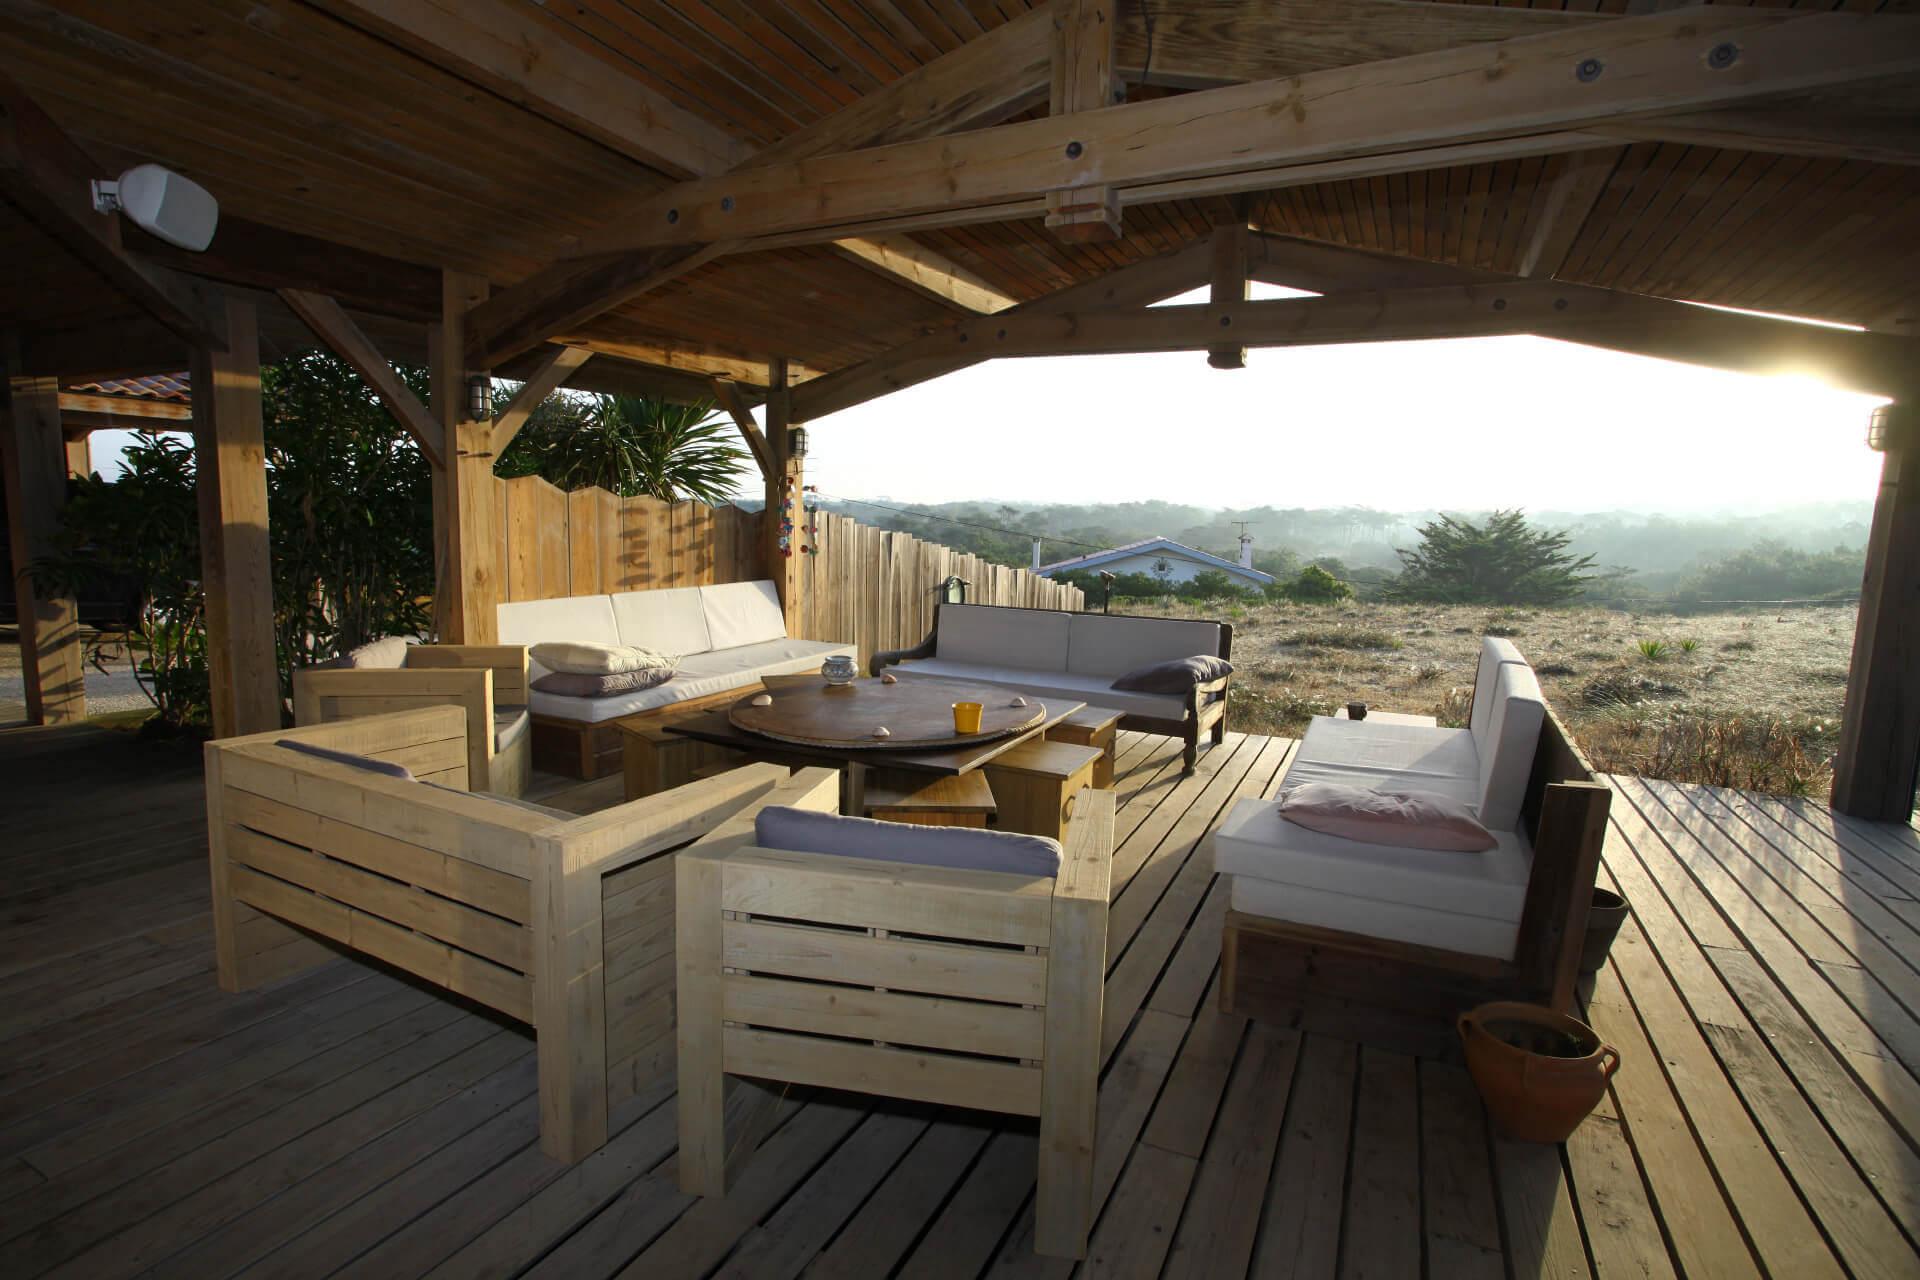 Terrasse 5 - Location Villa de Luxe Vue Mer à Seignosse Hossegor, Landes